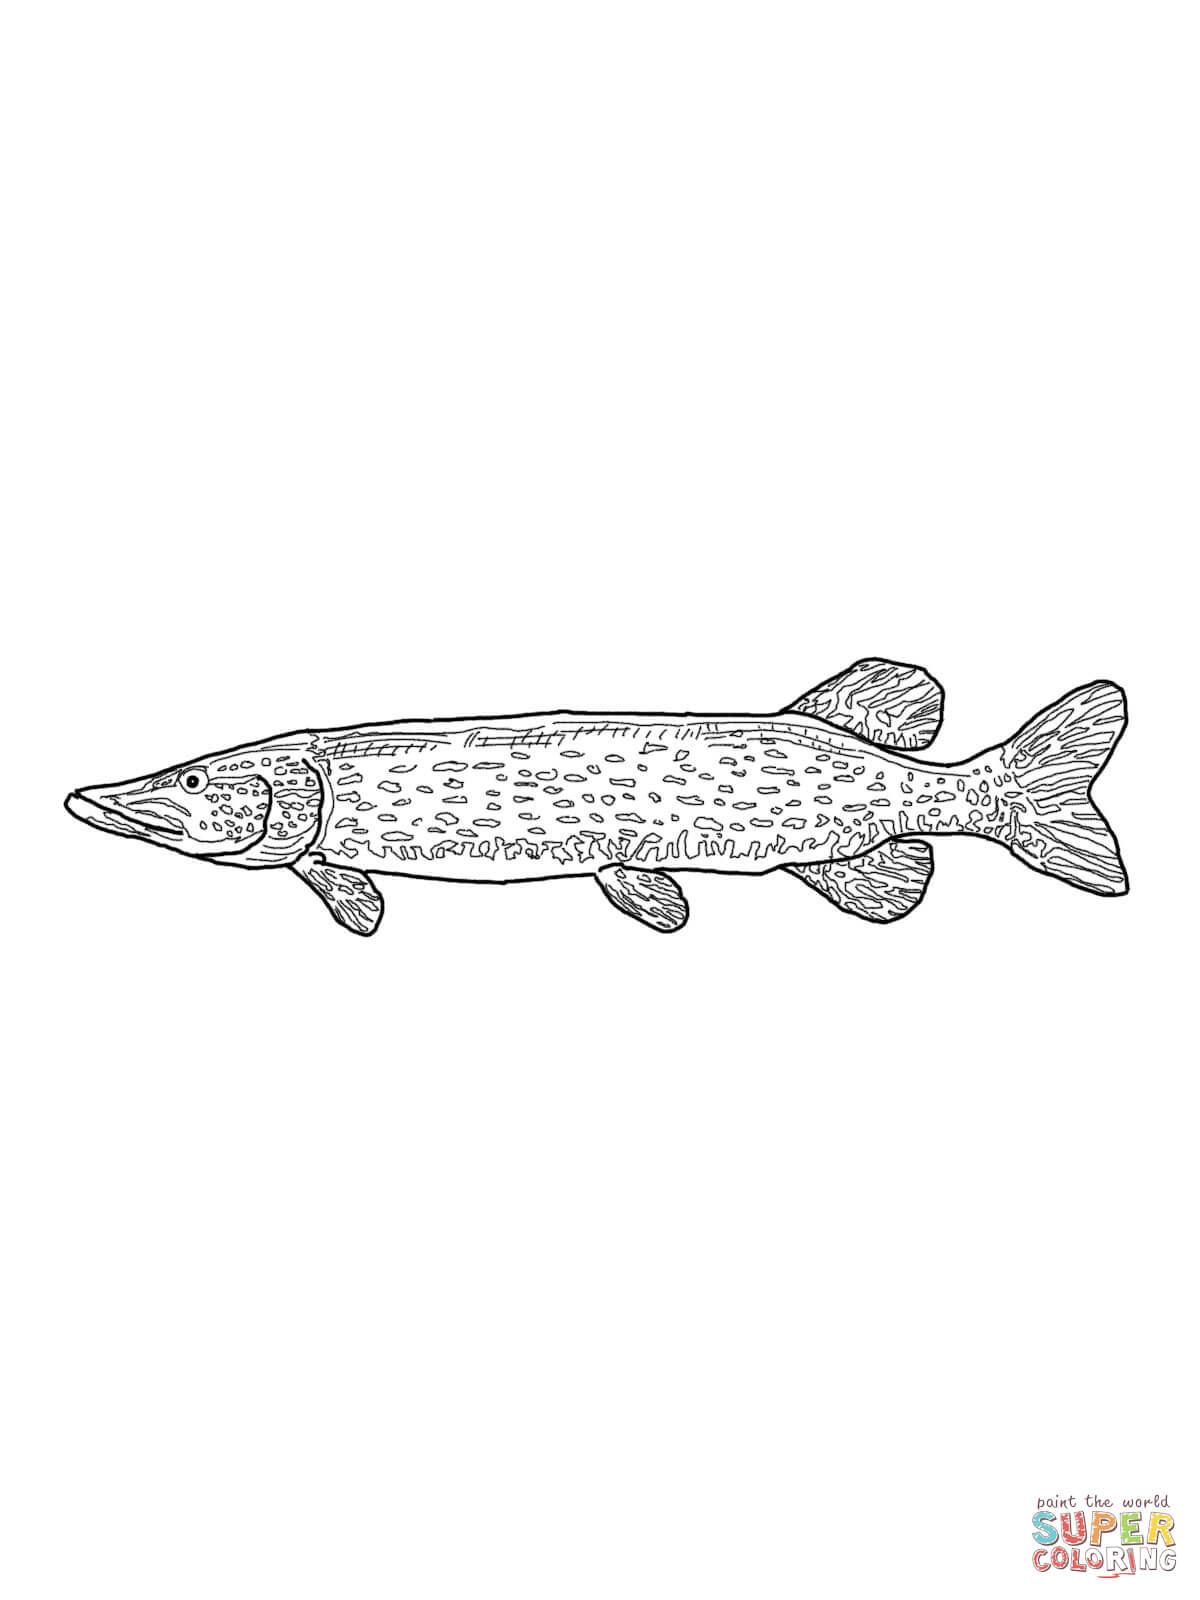 "Fische Bilder Zum Ausdrucken Frisch Pin by Myrto Tsakiraki ŽºŽŽ½""Ž·Ž¼Ž± Pinterest Einzigartig Fotos"